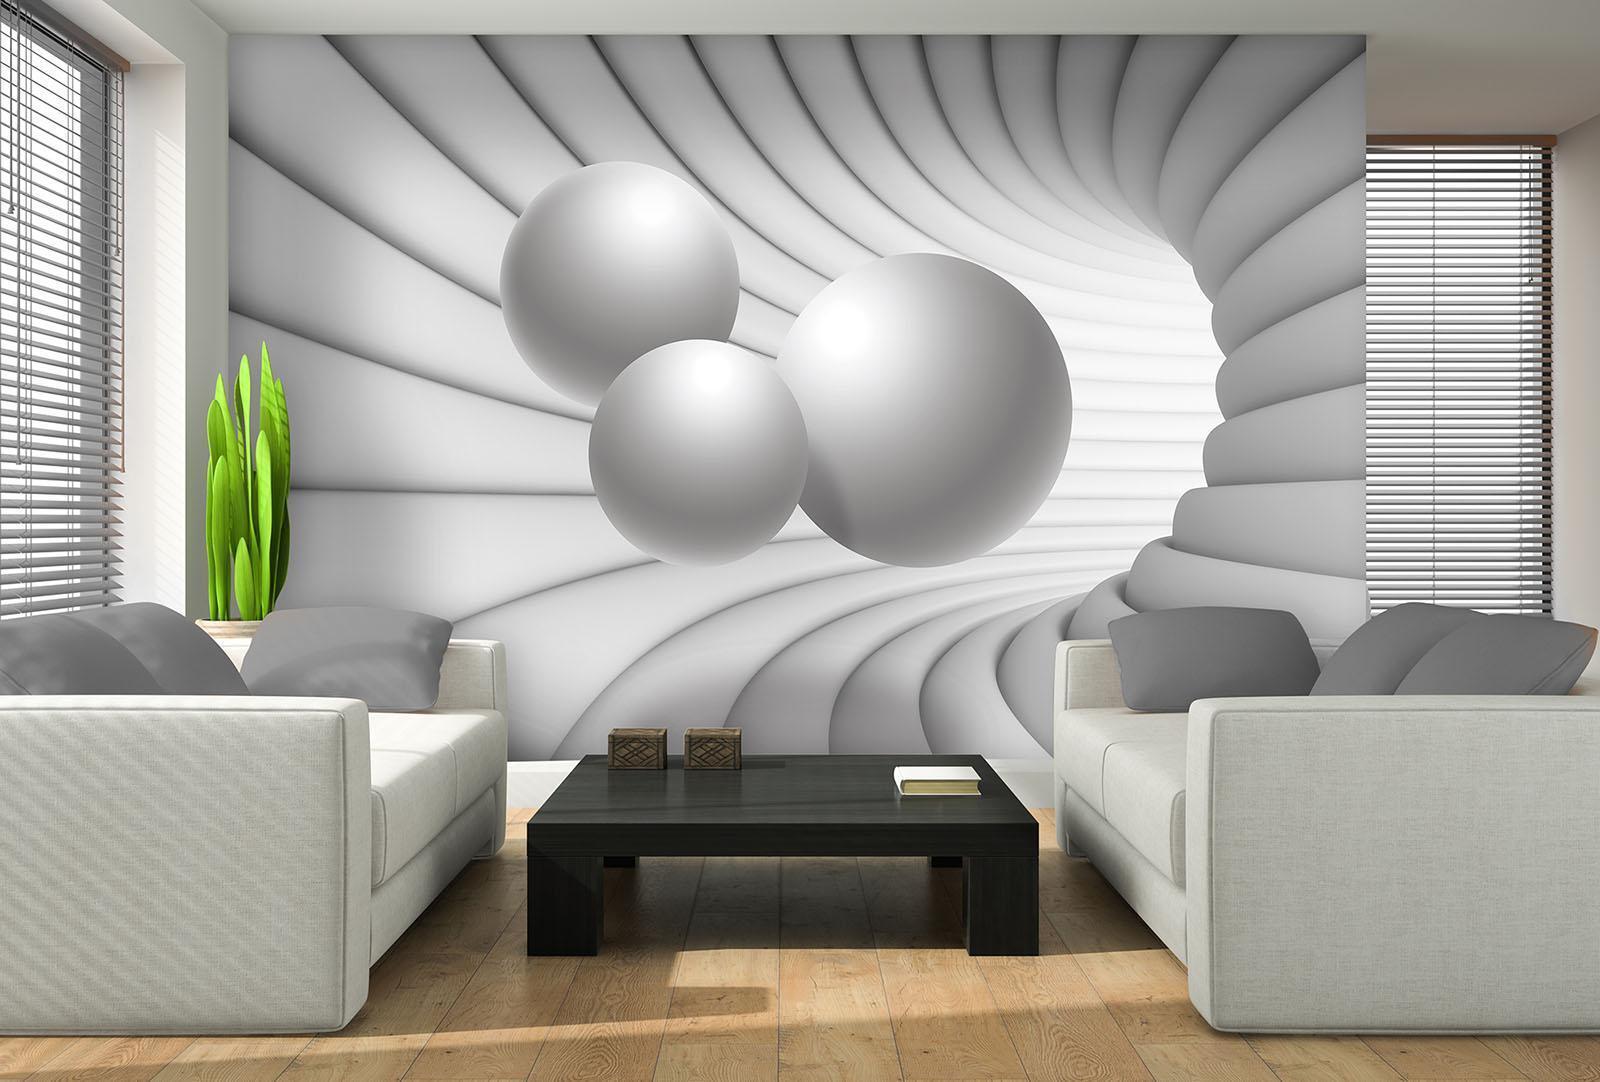 Vließ Fototapete Tapete Wandbild 3D Tunnel mit weissen Kugeln  310141_VEMVT